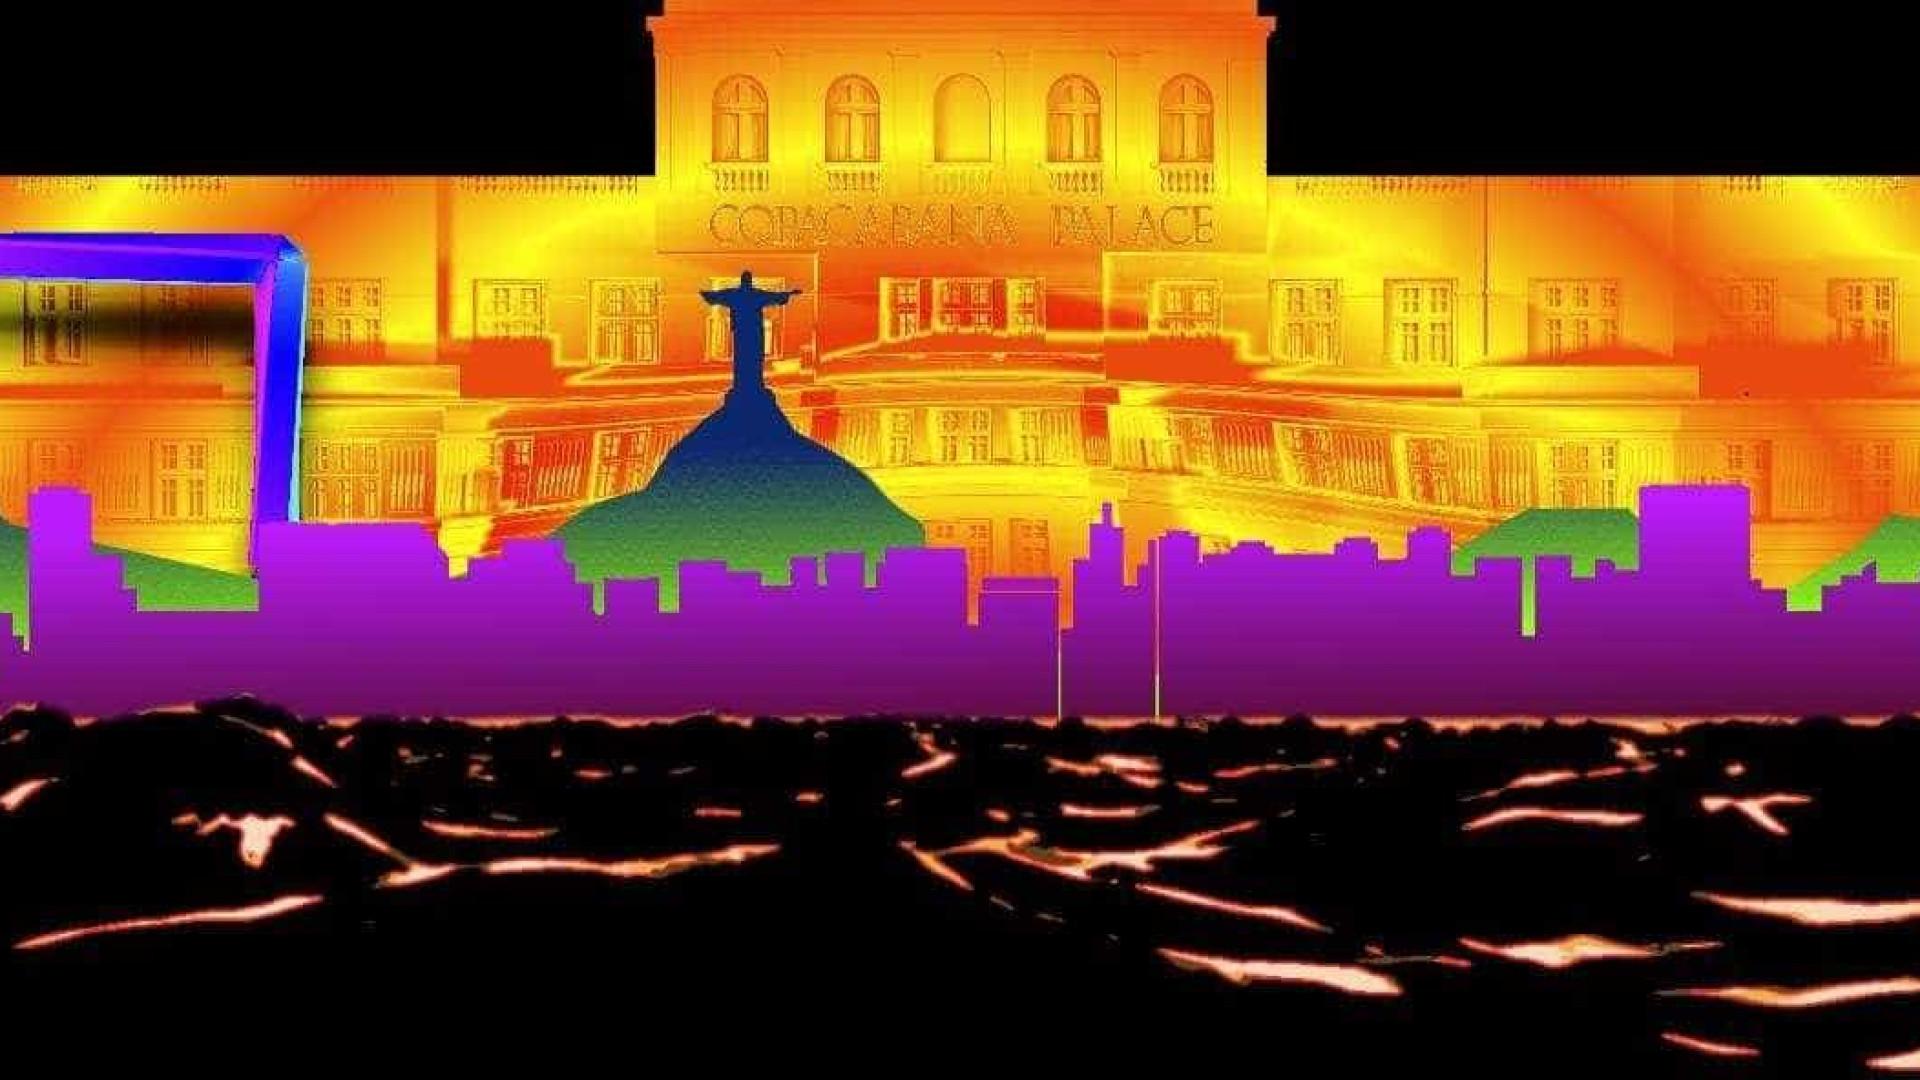 United VJs apresentam 'video mapping' na fachada do Copacabana Palace